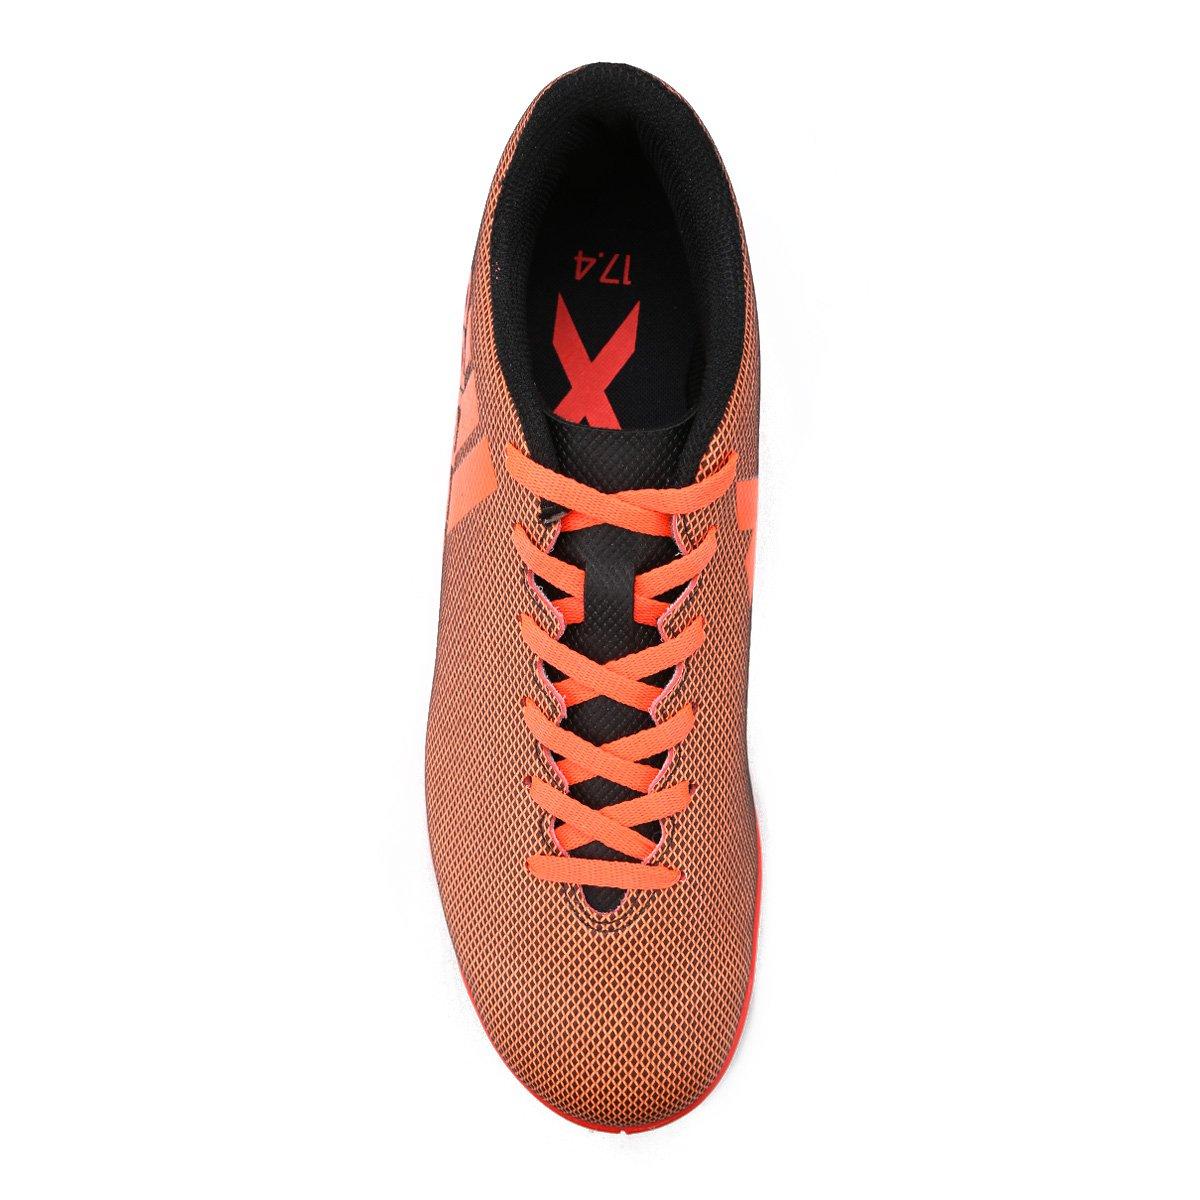 Futsal Chuteira X Adidas 17 IN Masculina Masculina X IN 4 Laranja 4 Laranja Adidas 17 Futsal Chuteira AwA4tqp